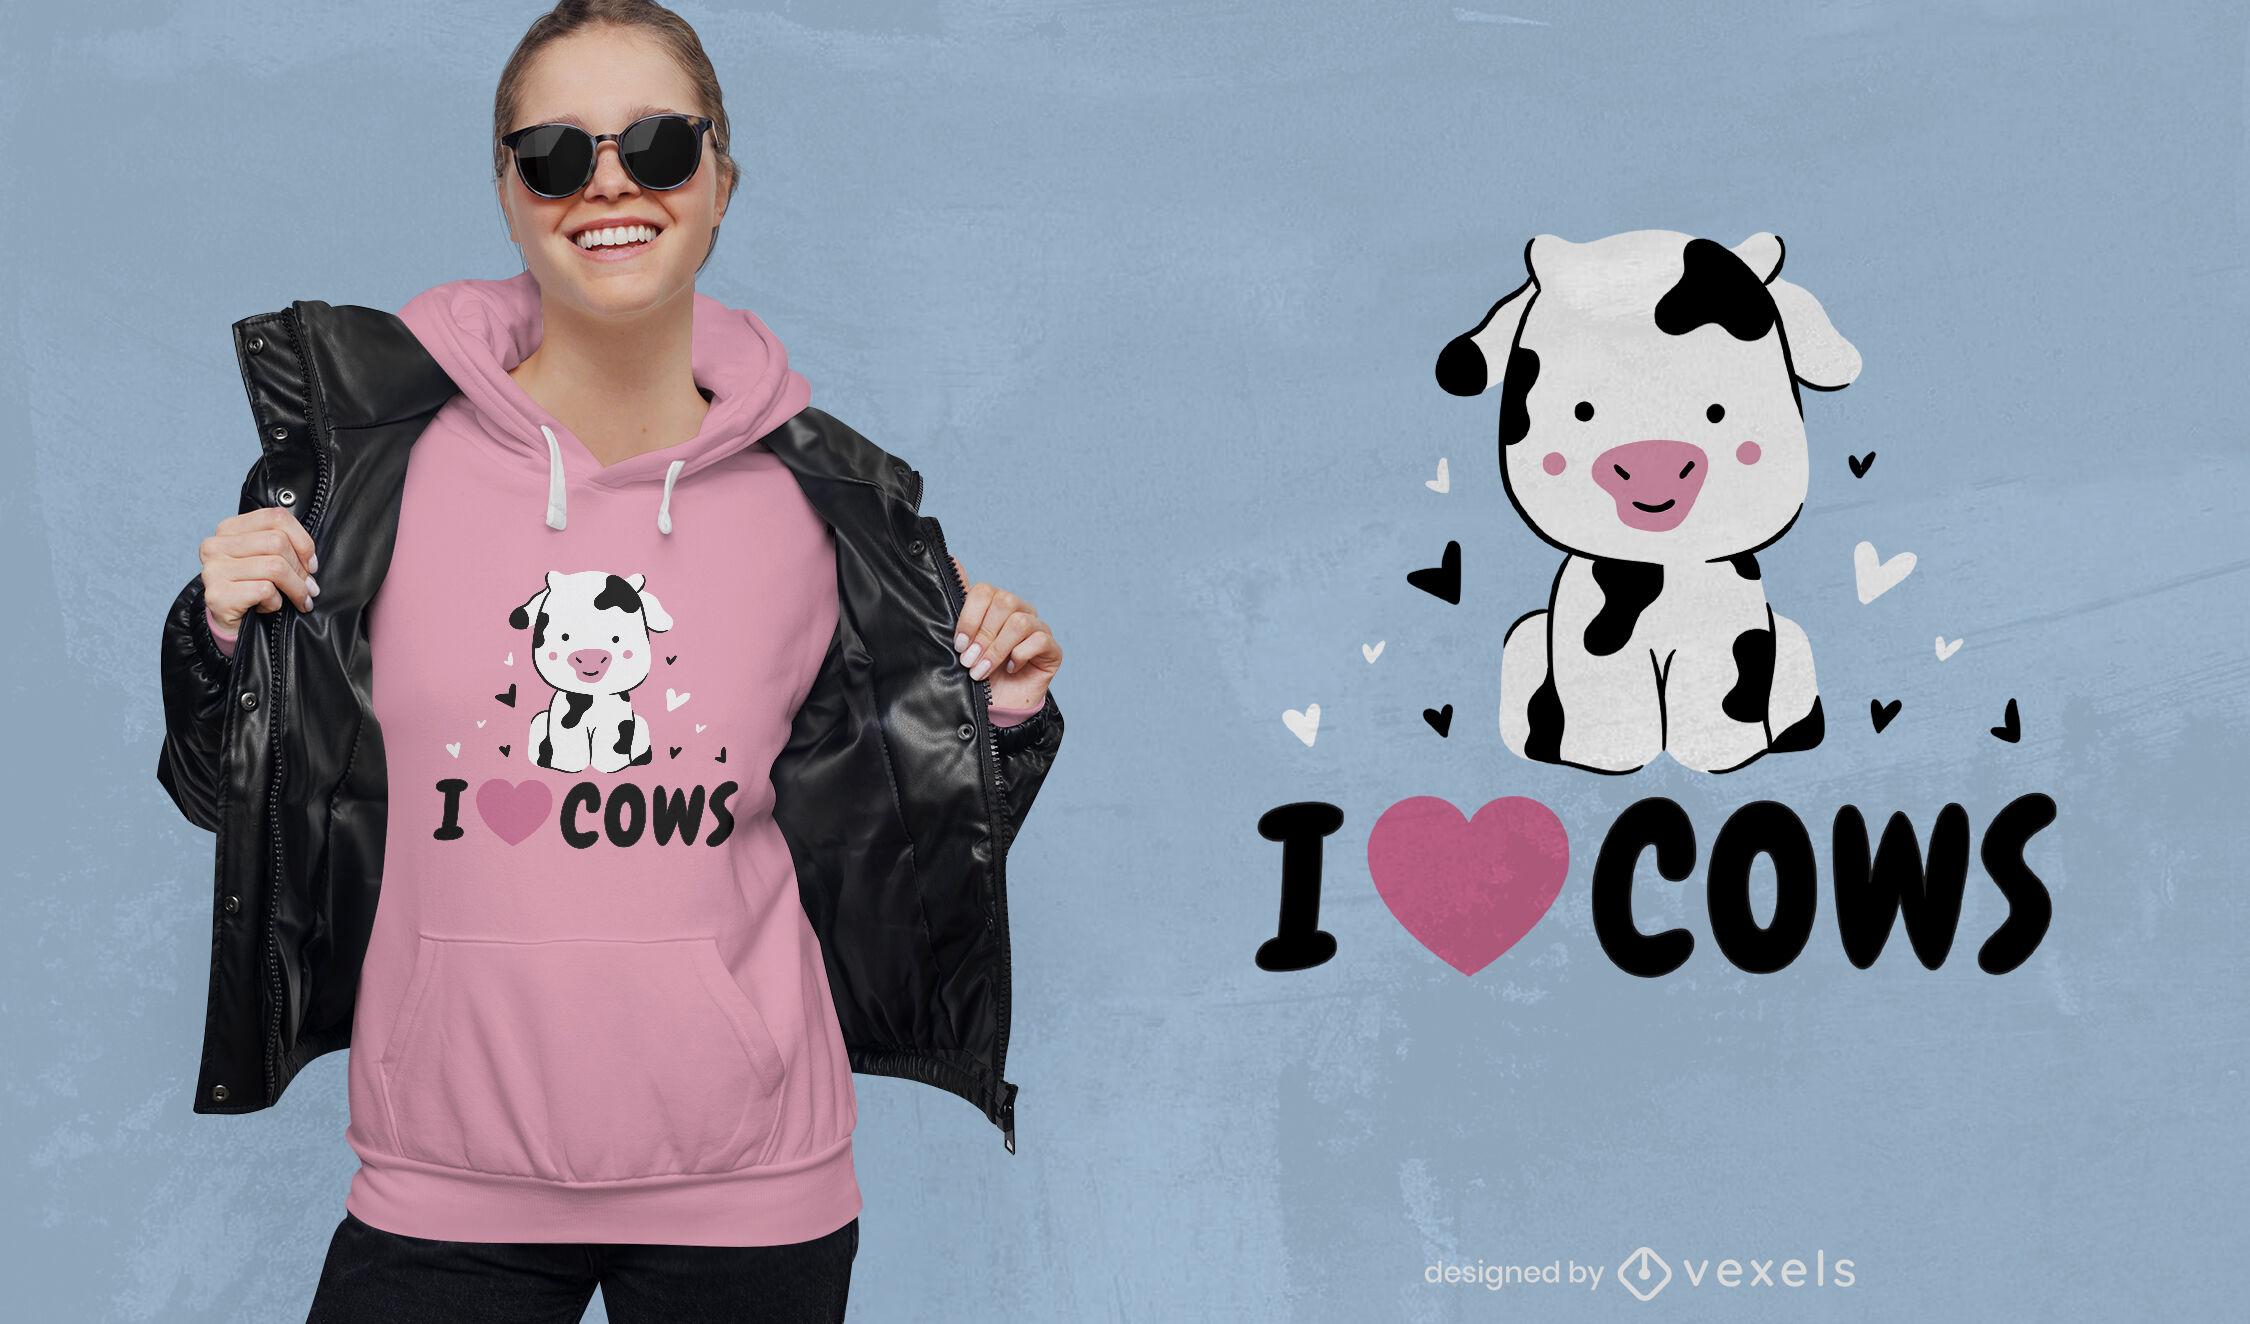 Cows lover t-shirt design